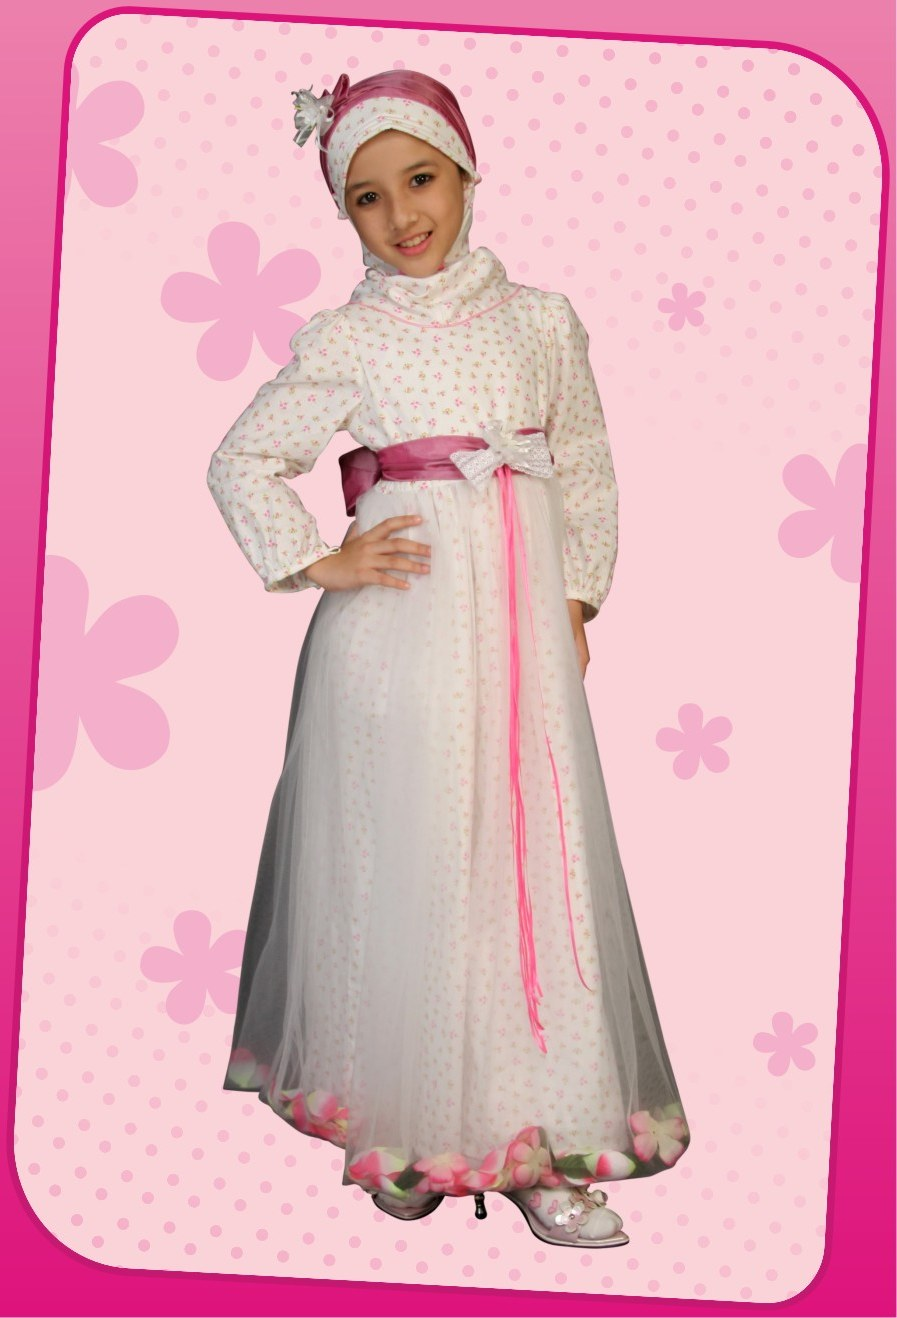 Ide Baju Lebaran Bayi Perempuan 9fdy Trend Busana Muslim Anak Perempuan 2016 Busana Muslim Terbaru